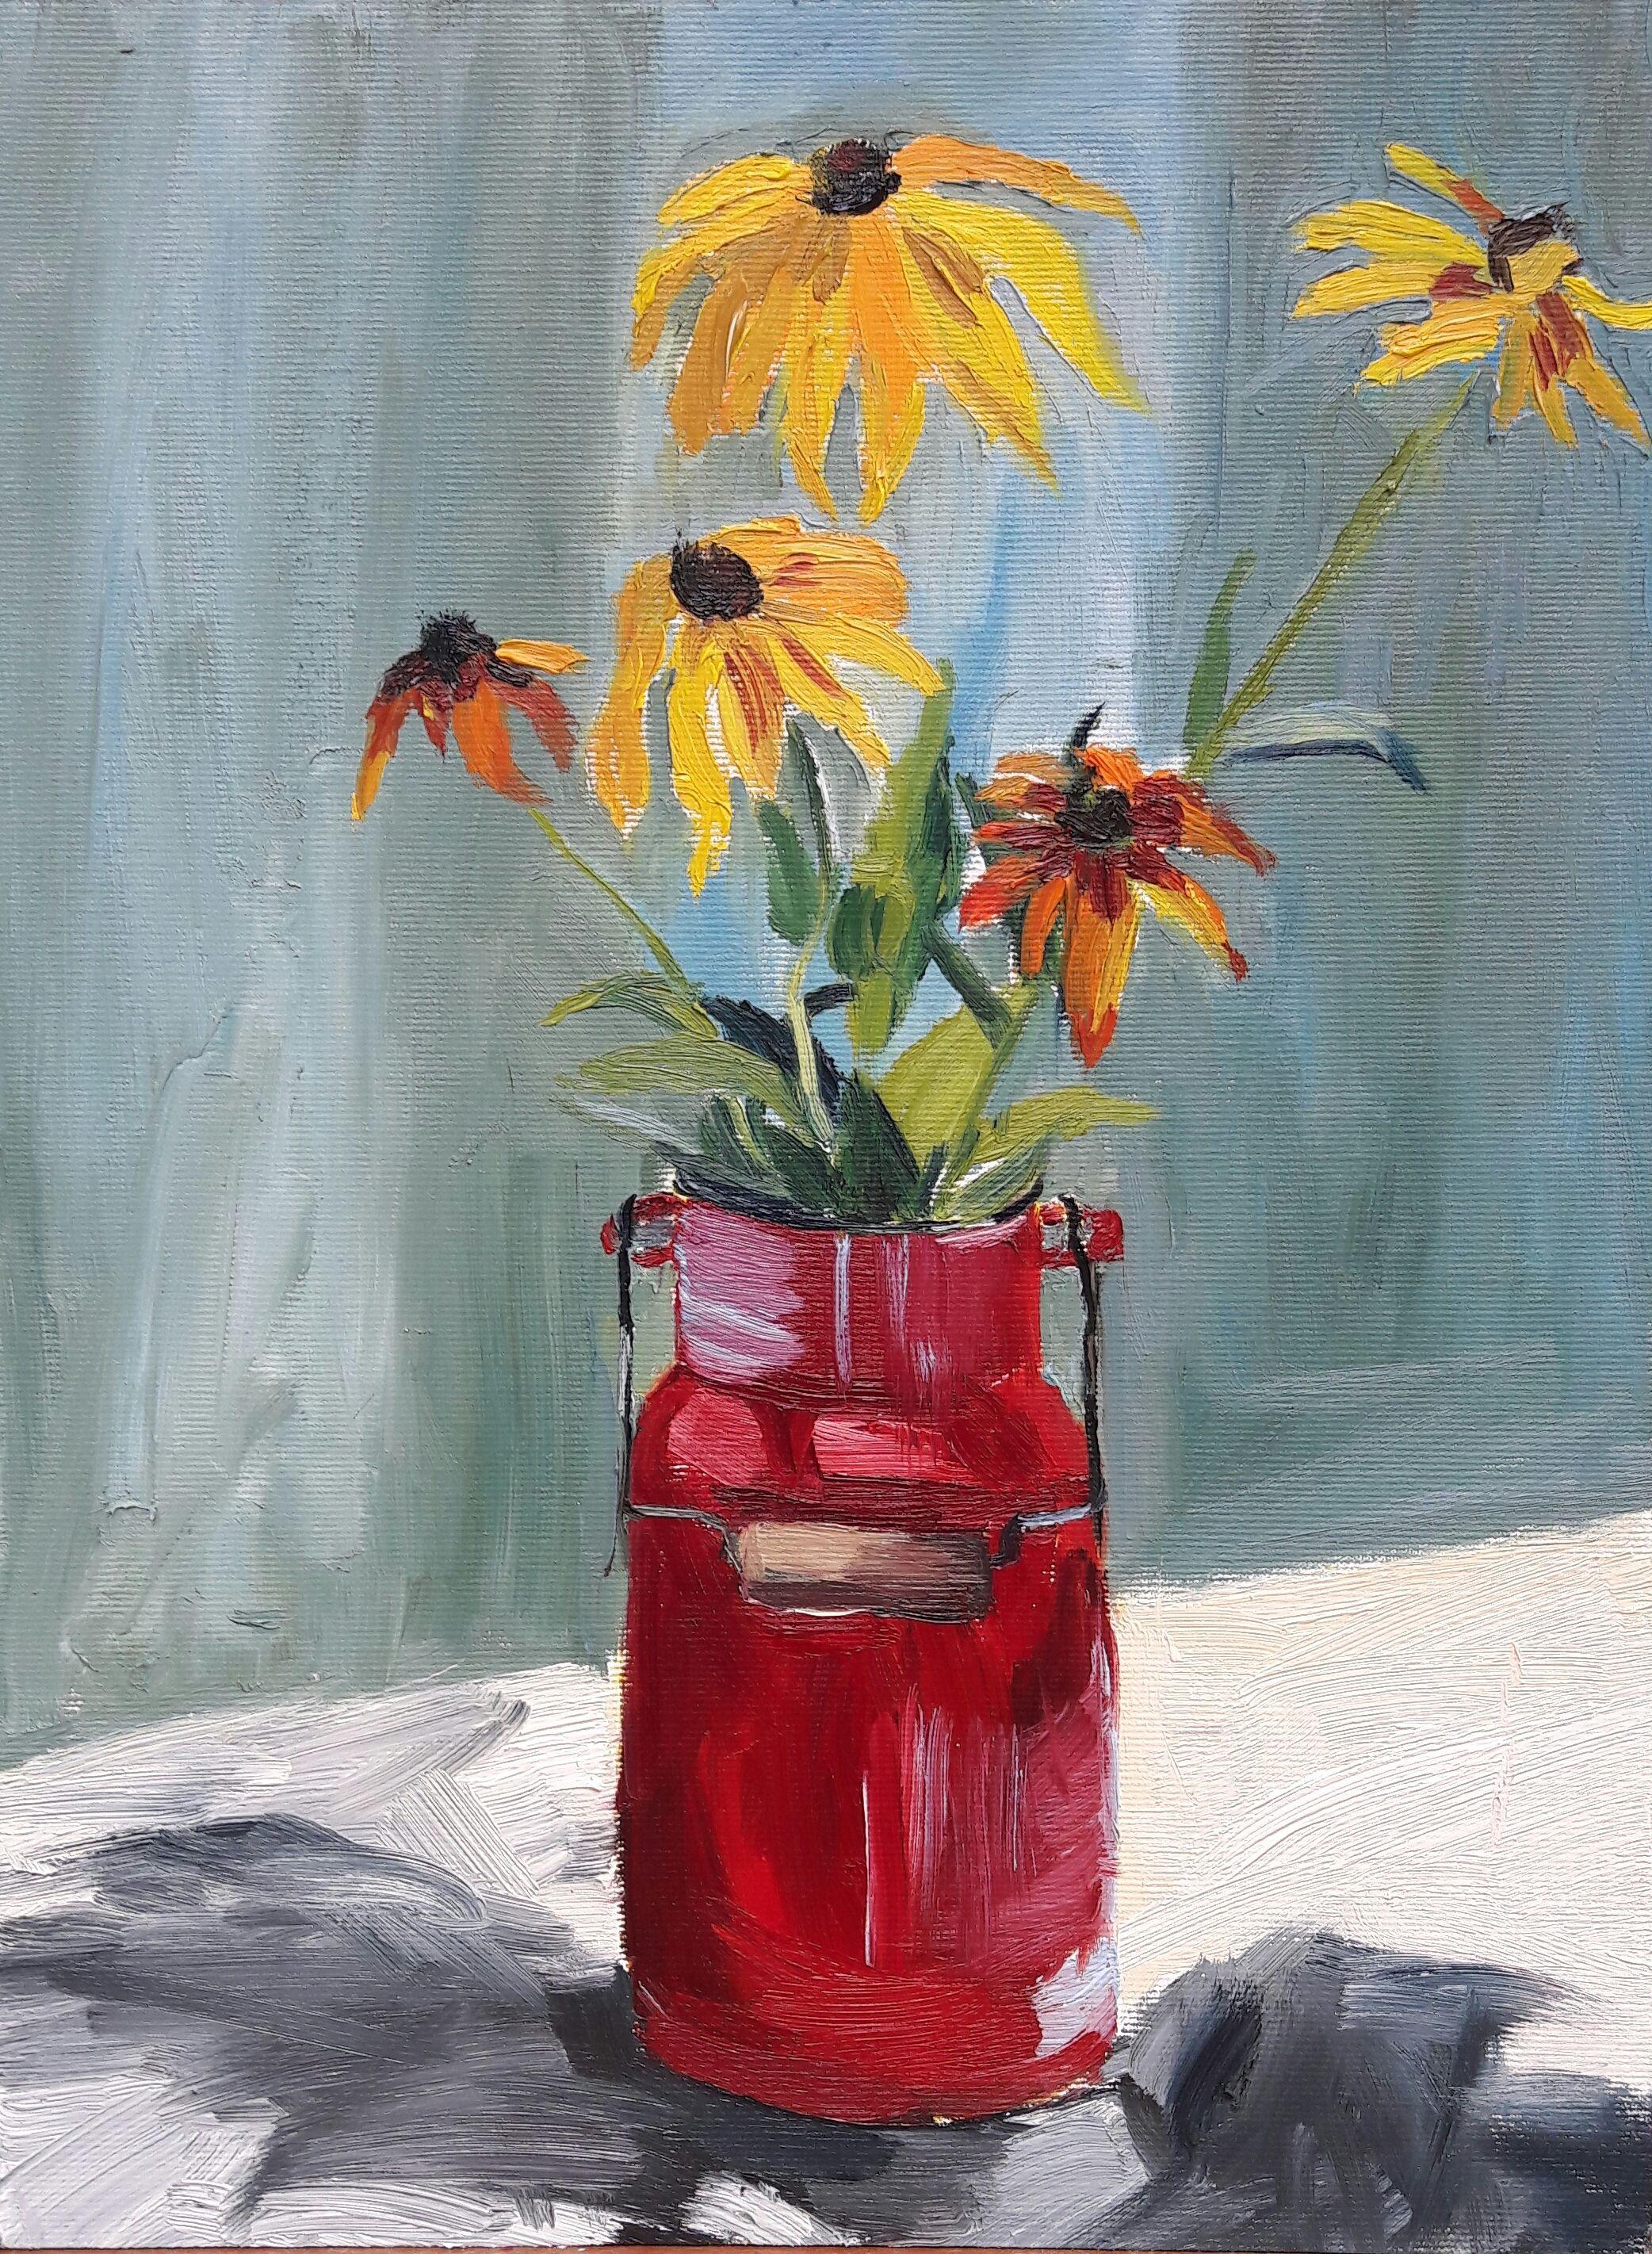 #Yellowflowers Inredcan By Anna Brzeska #Stilllife #Yellowflowers #Oilpainting